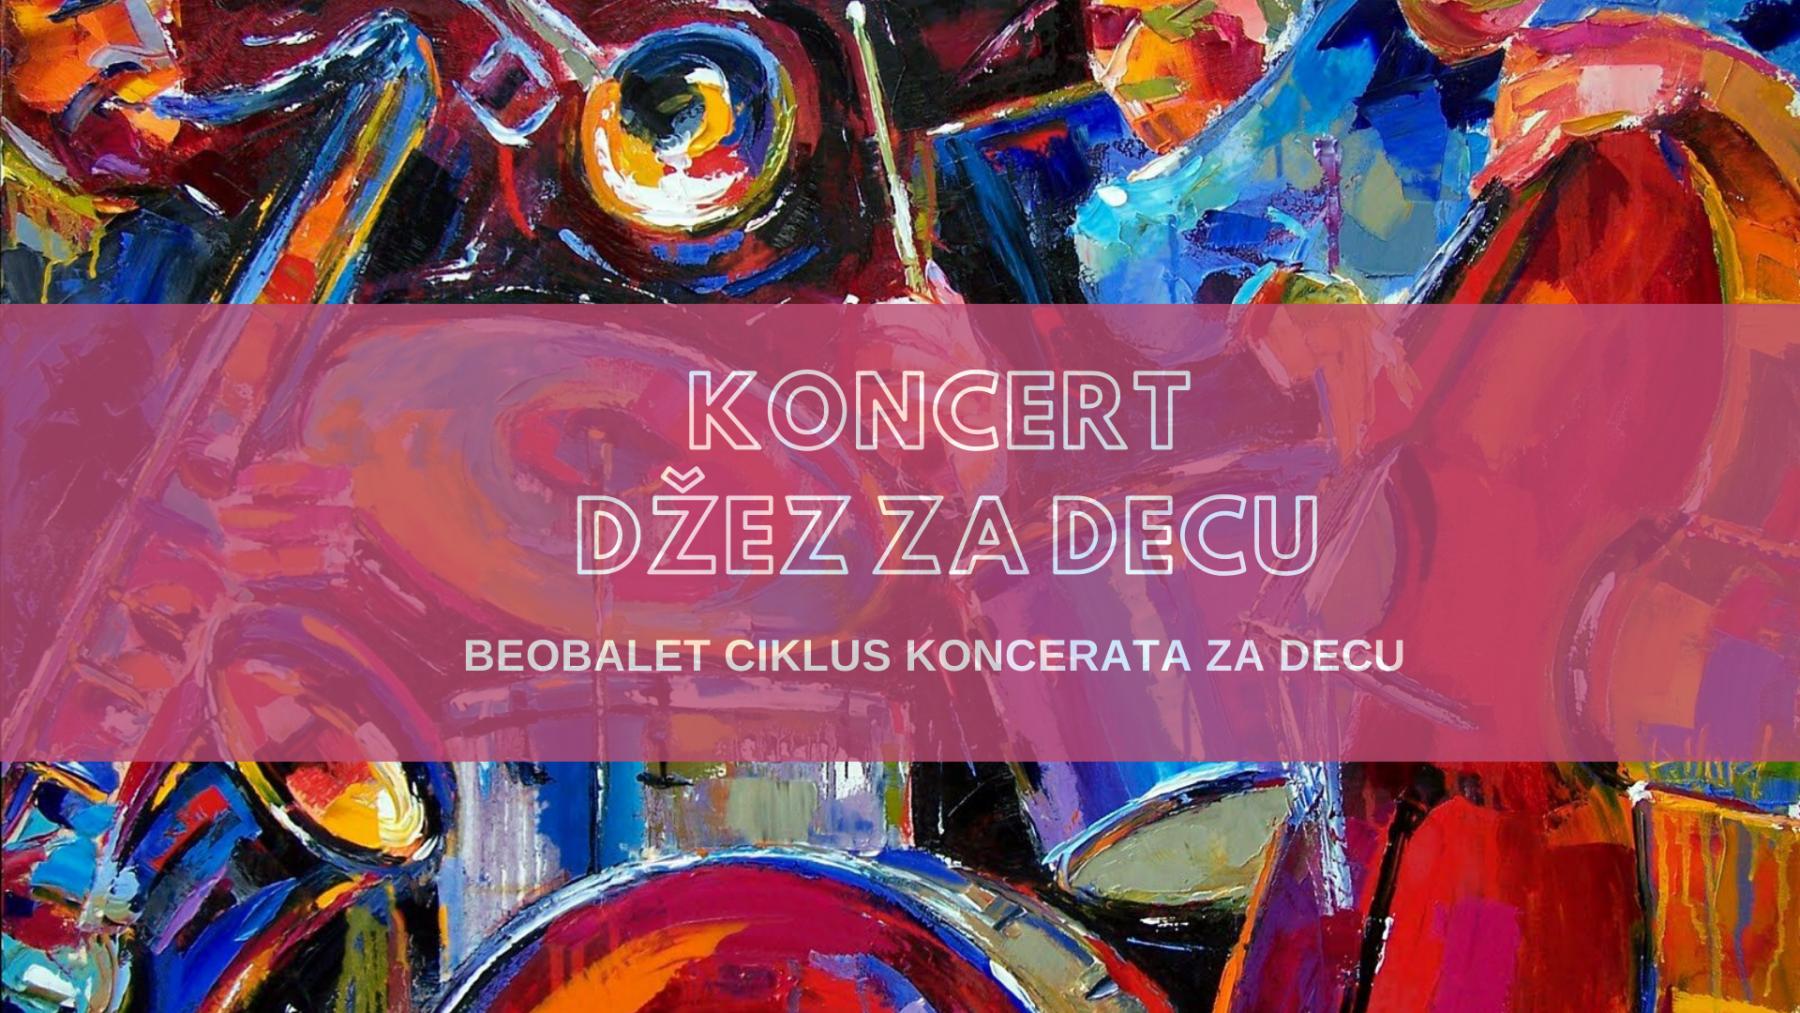 BeoBalet koncert Dzez za decu